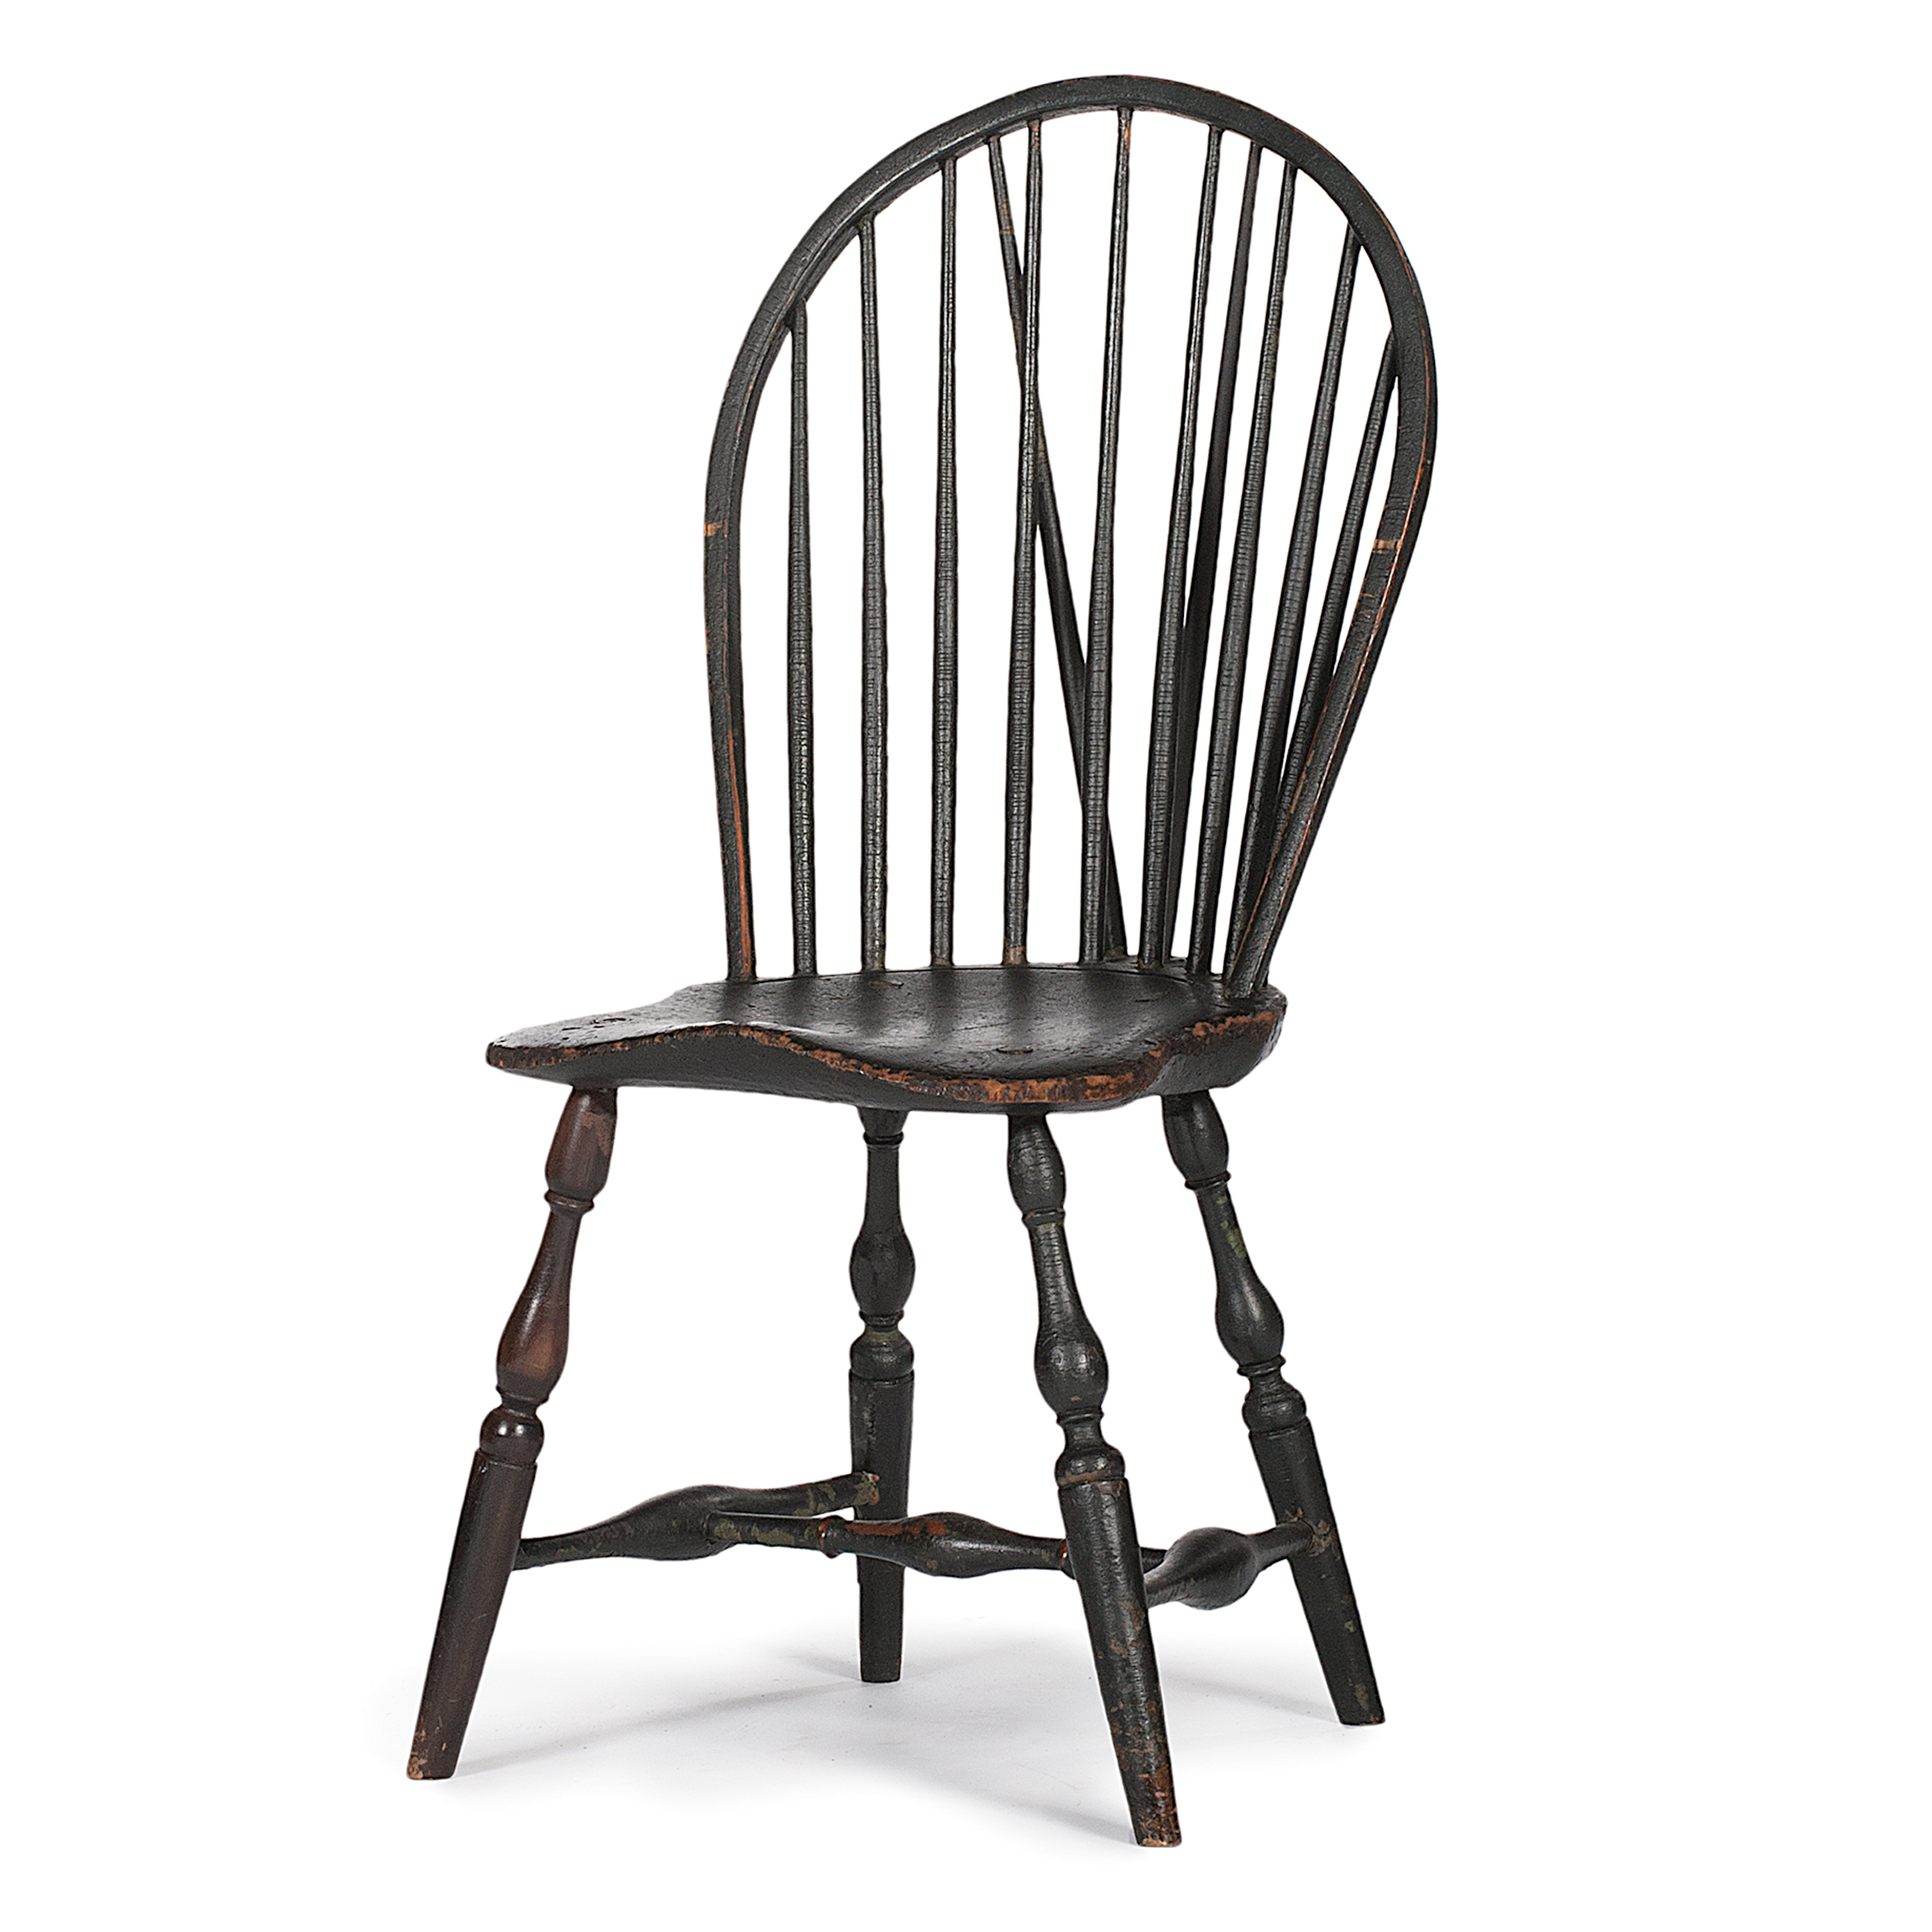 Brace Back Windsor Side Chair  Cowans Auction House The